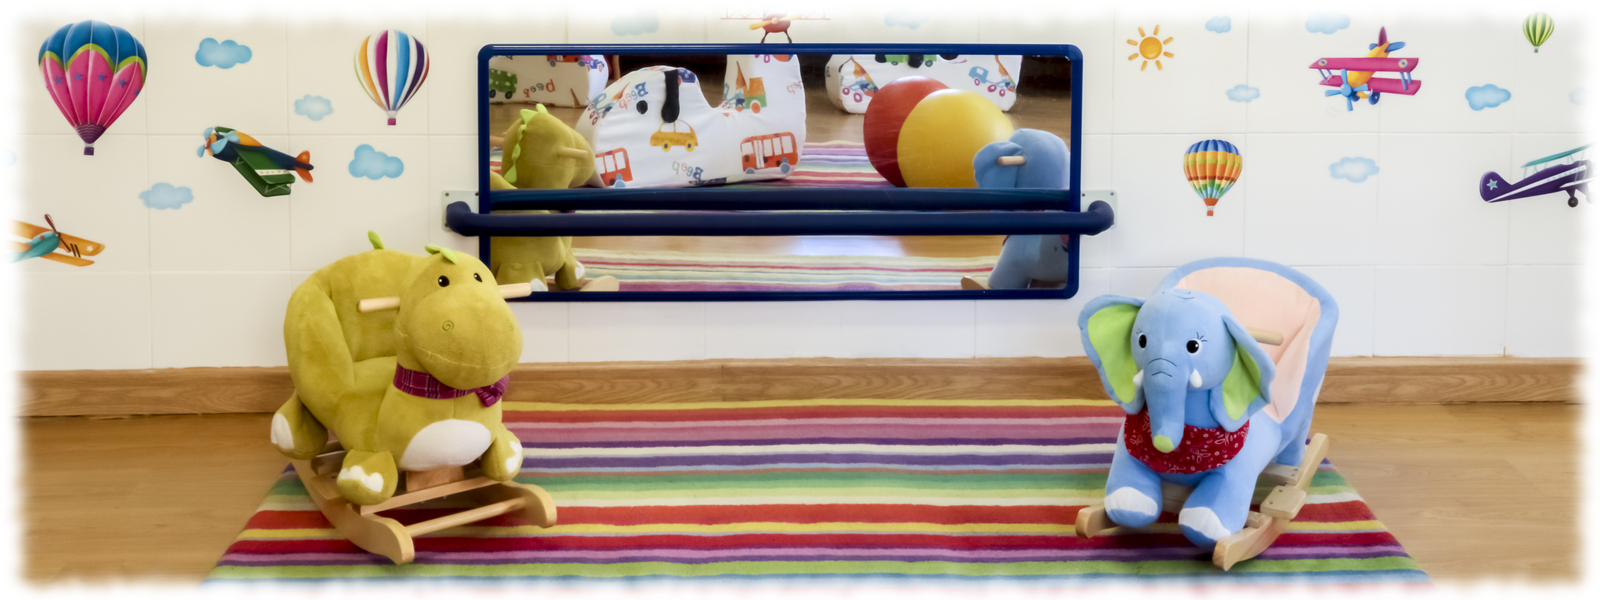 Espejo en el aula de bebés de la Escuela Infantil Booma en Talavera de la Reina